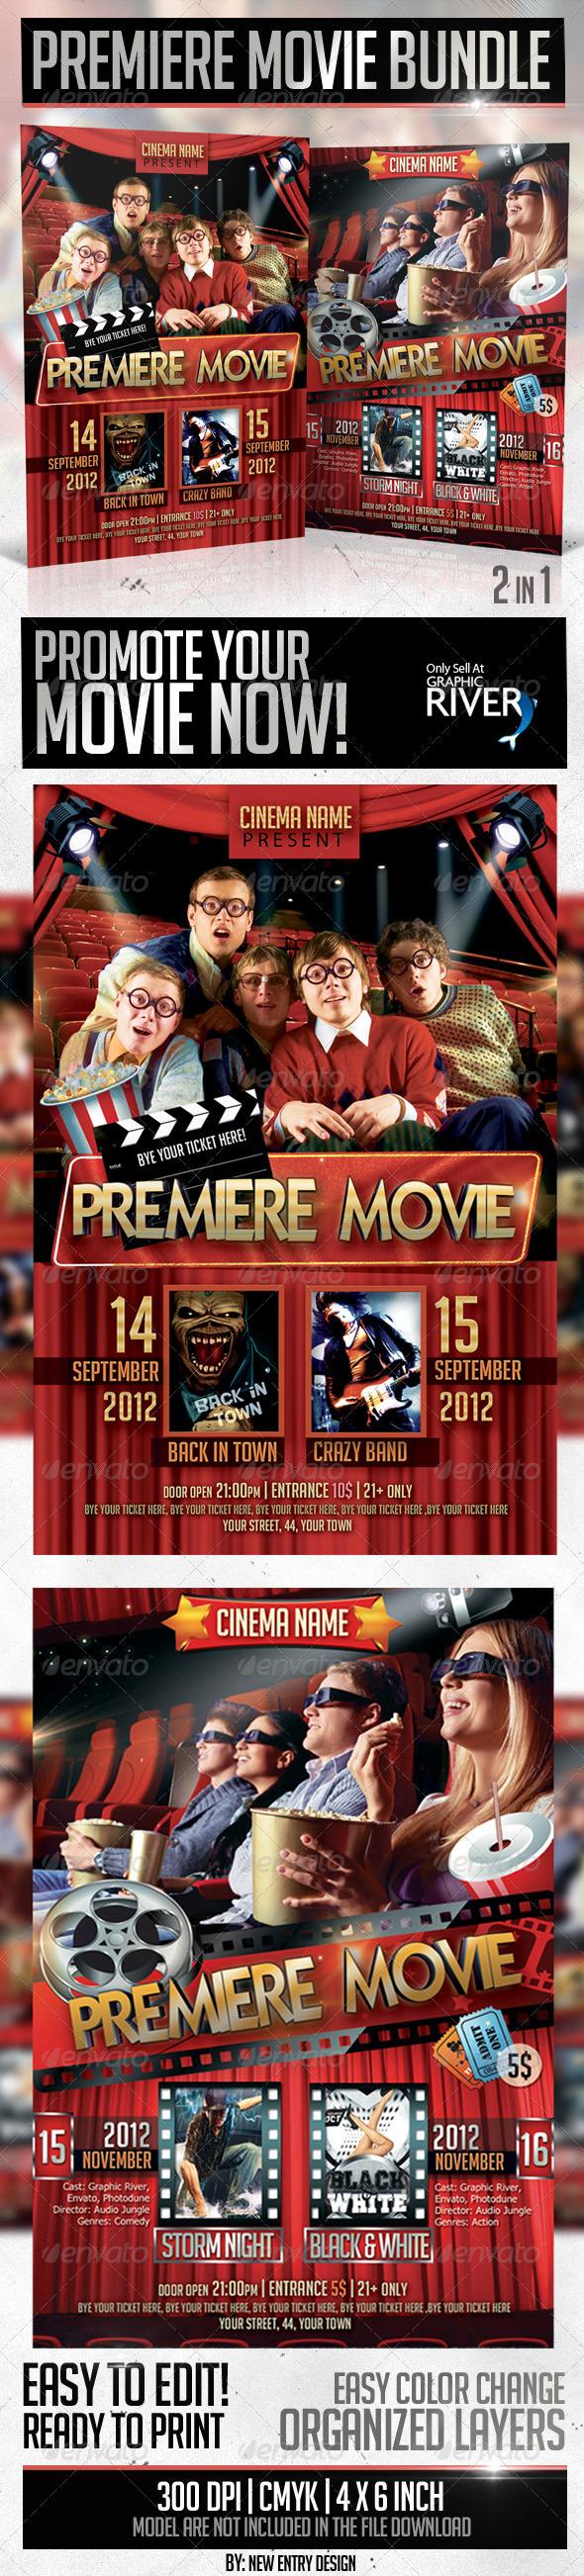 GraphicRiver Premiere Movie Flyer Bundle 2in1 3654070